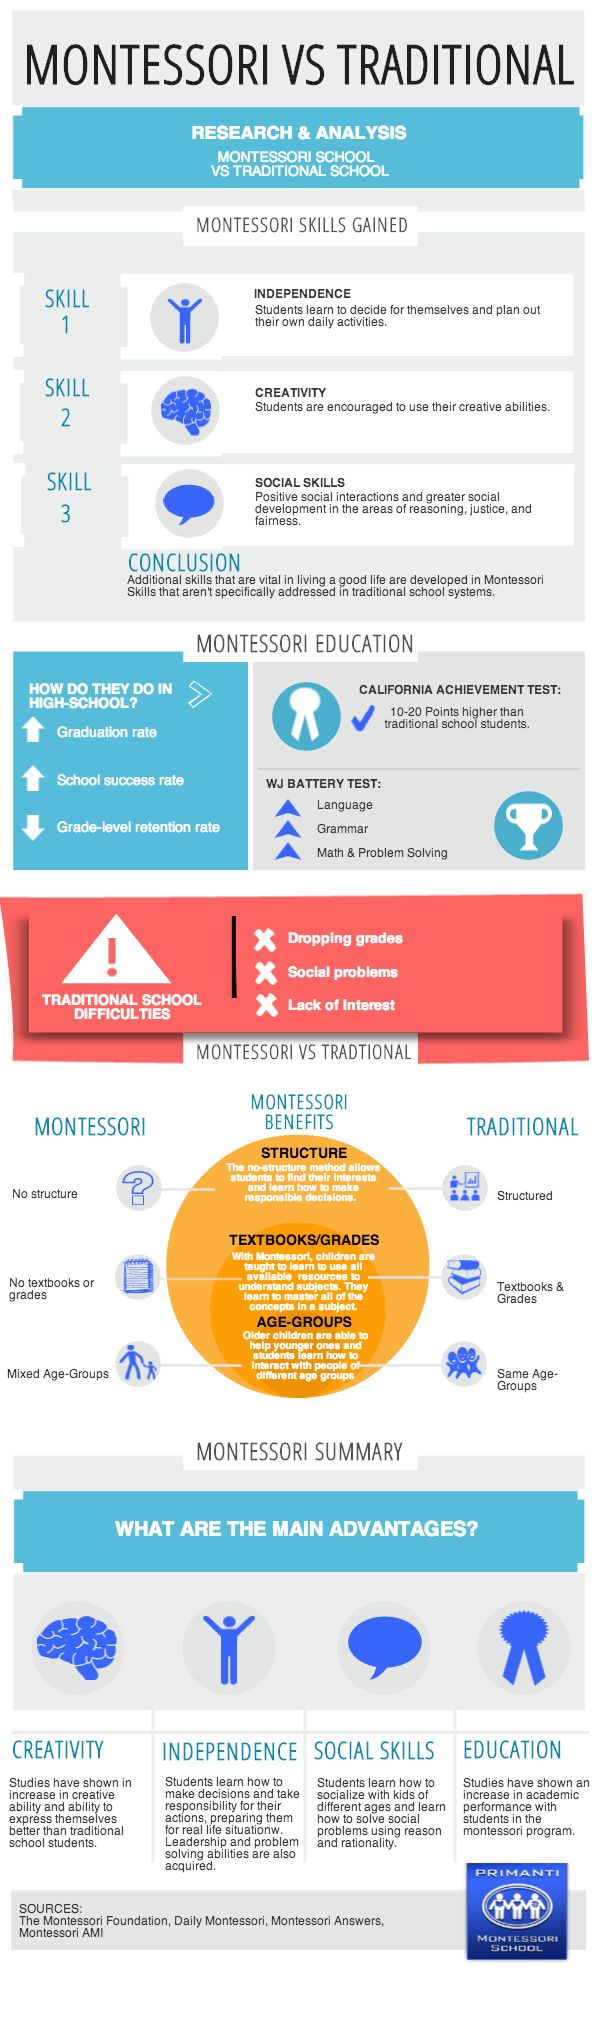 Montessori infographic showing Montessori School vs Traditional School. What are the advantages and how are they different? #montessori #montessoriinfographic #infographic